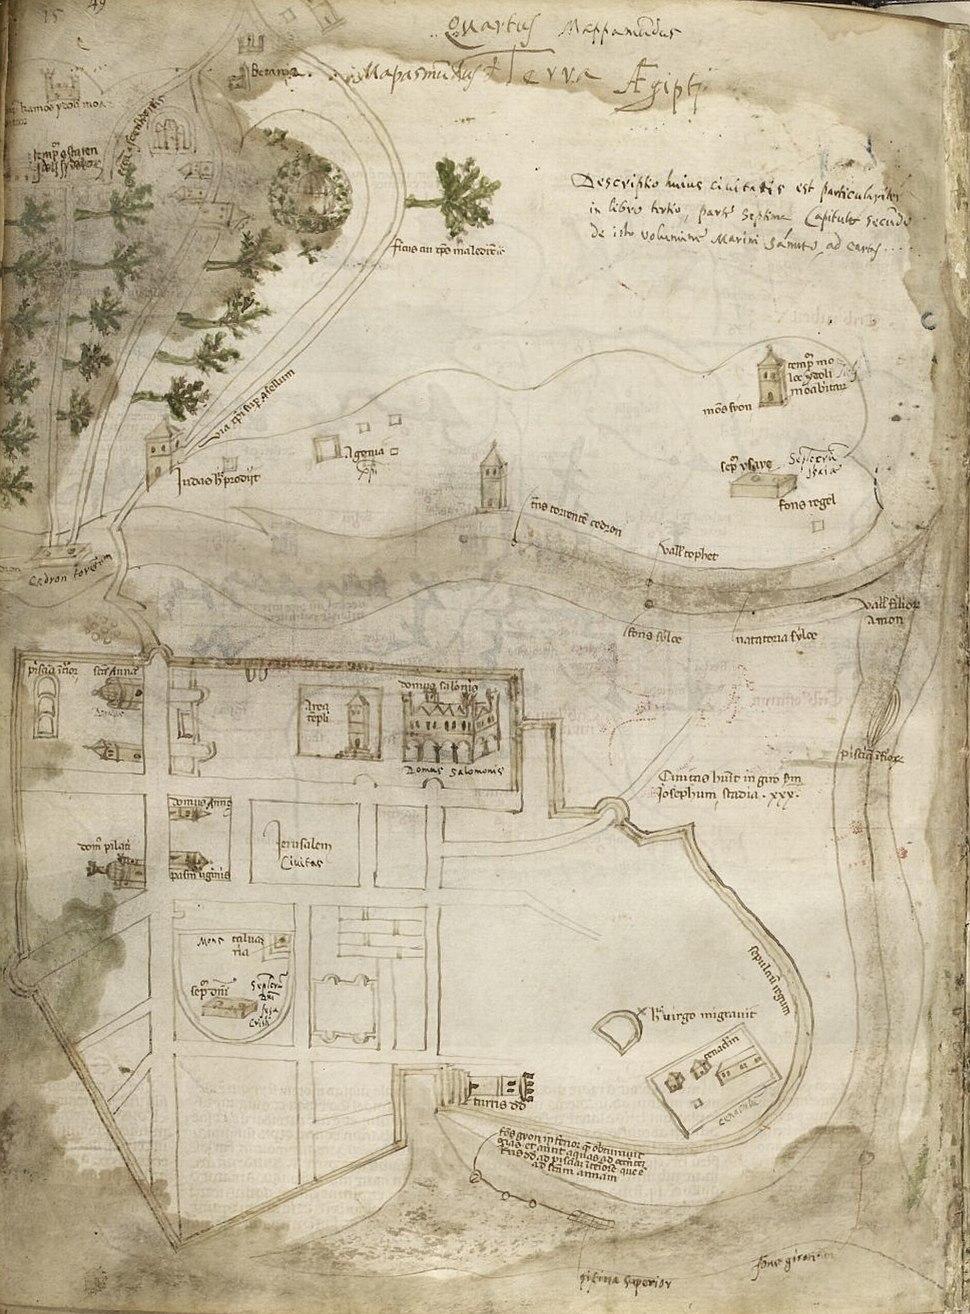 1321 map of Jerusalem from Sanudo-Vesconte's Liber Secretorum